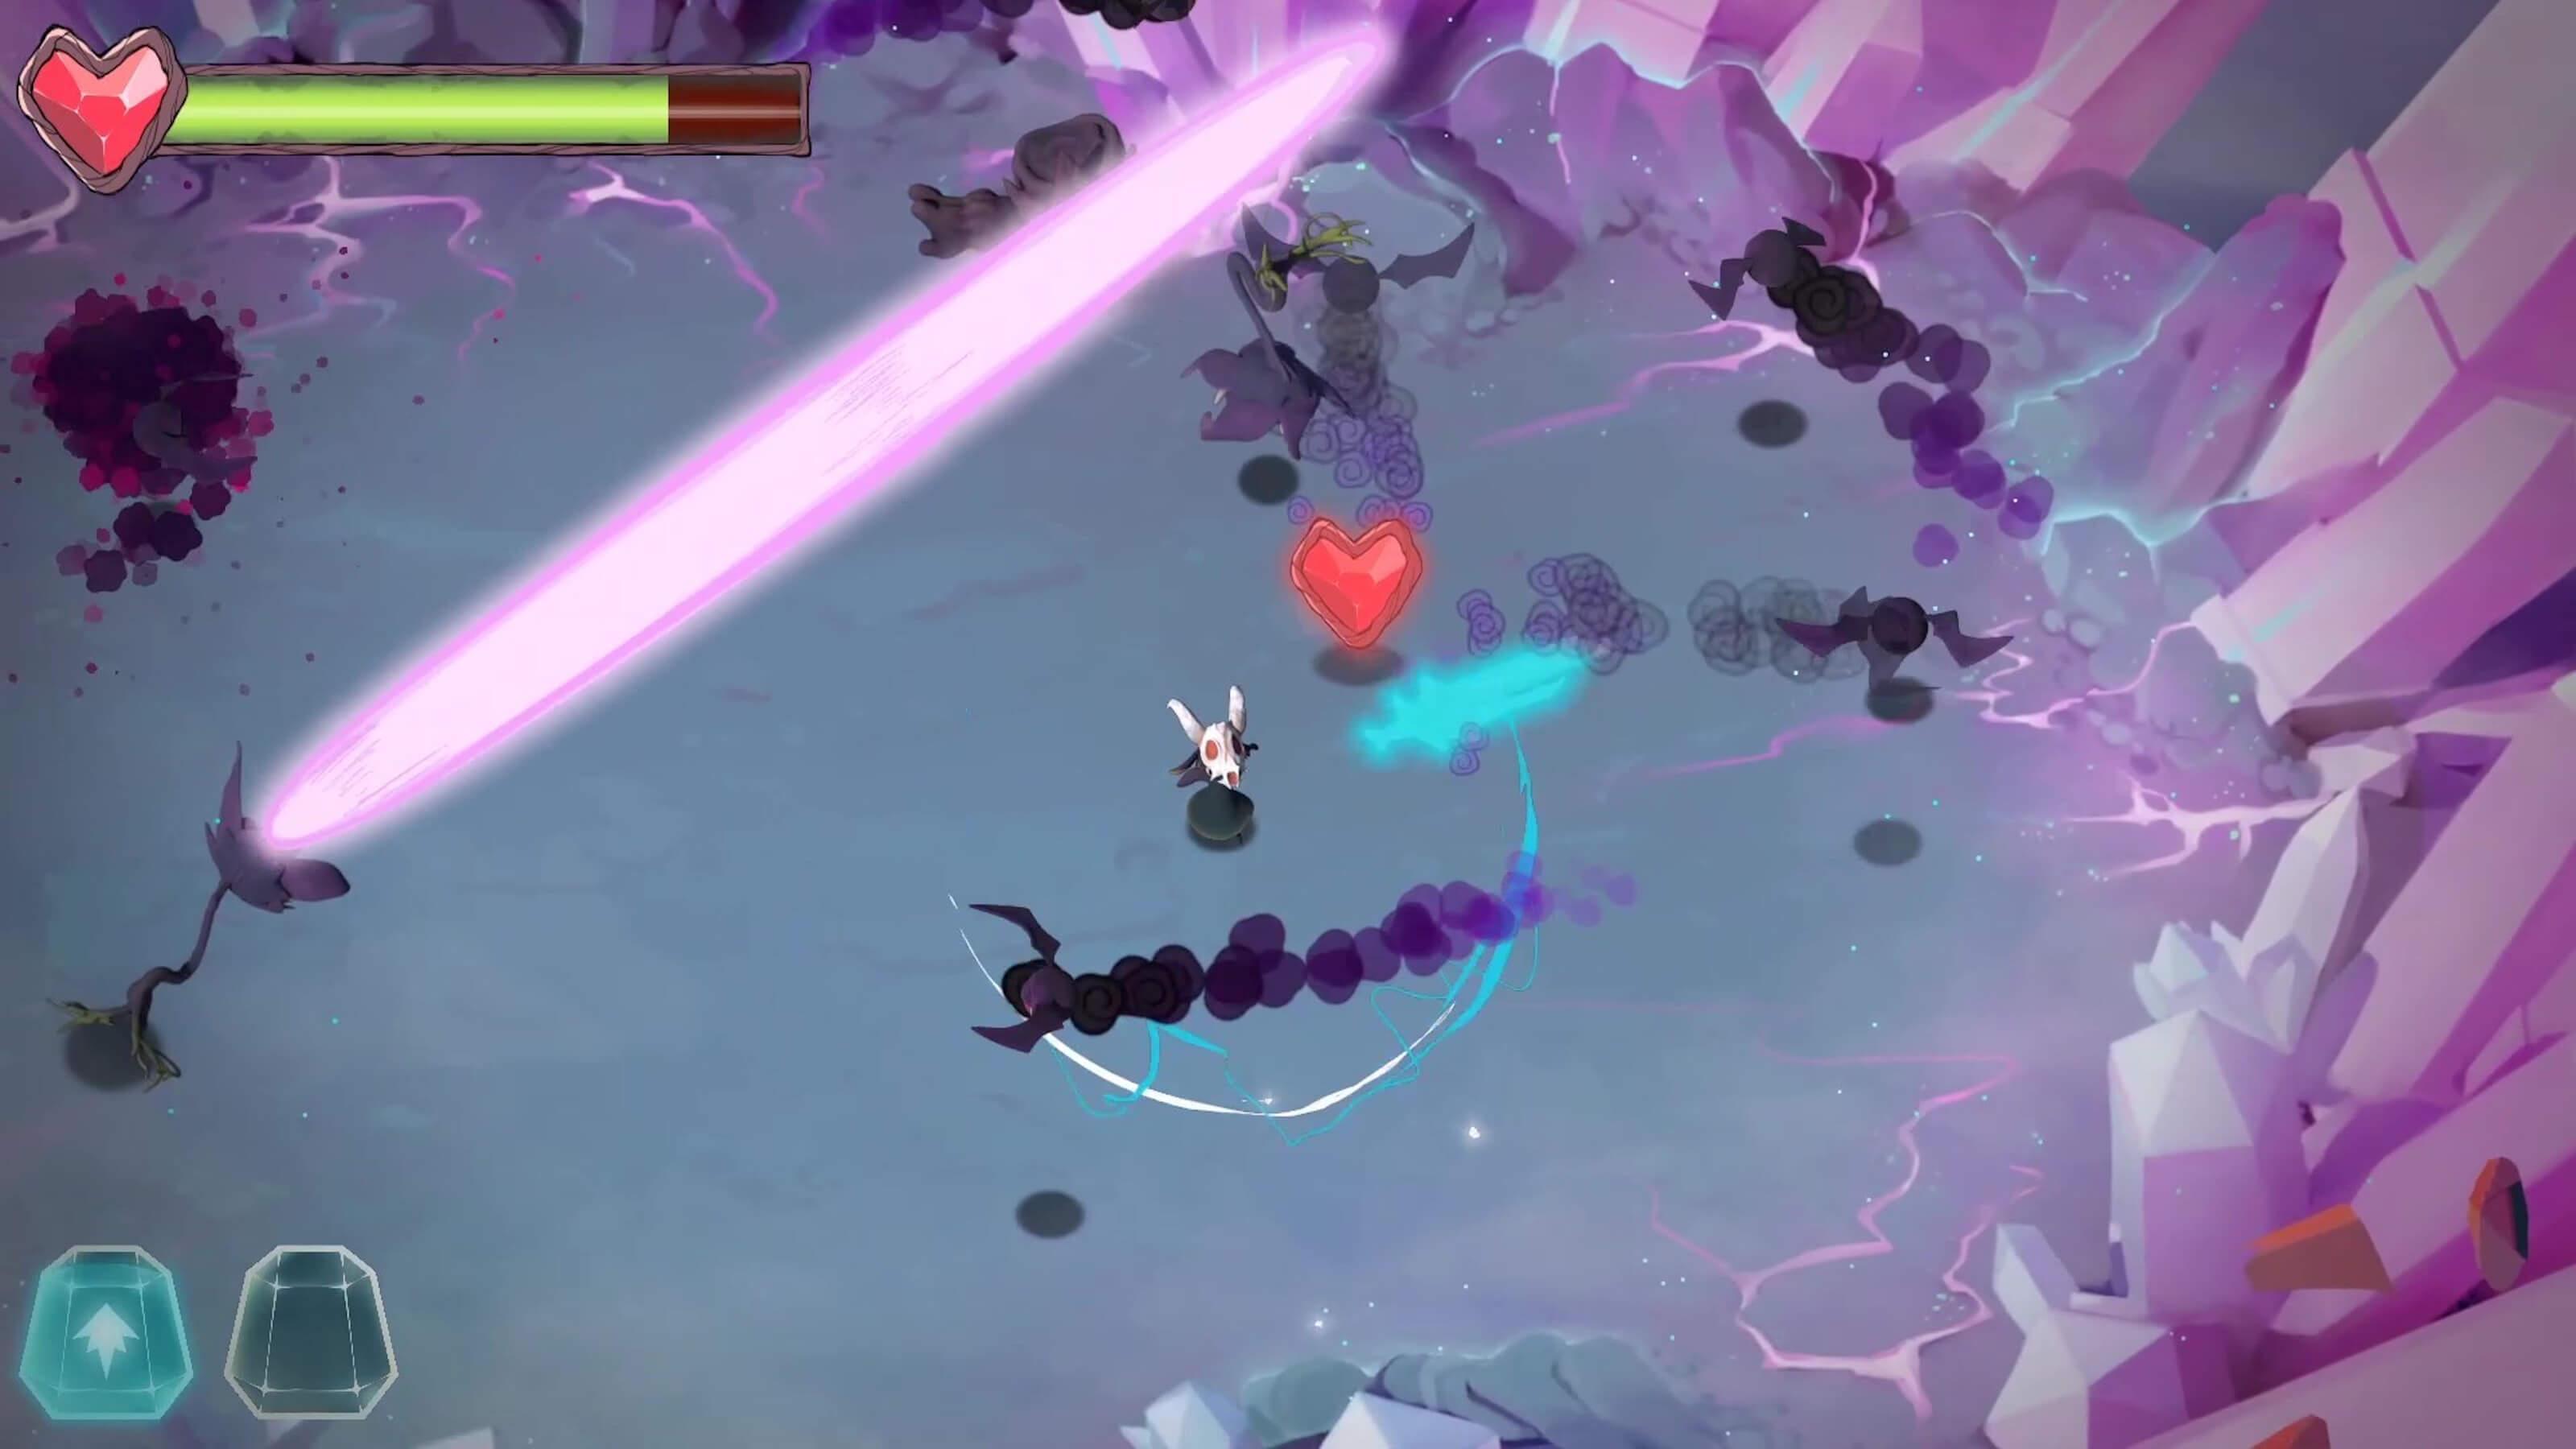 Skull creature battles multiple spirit enemies